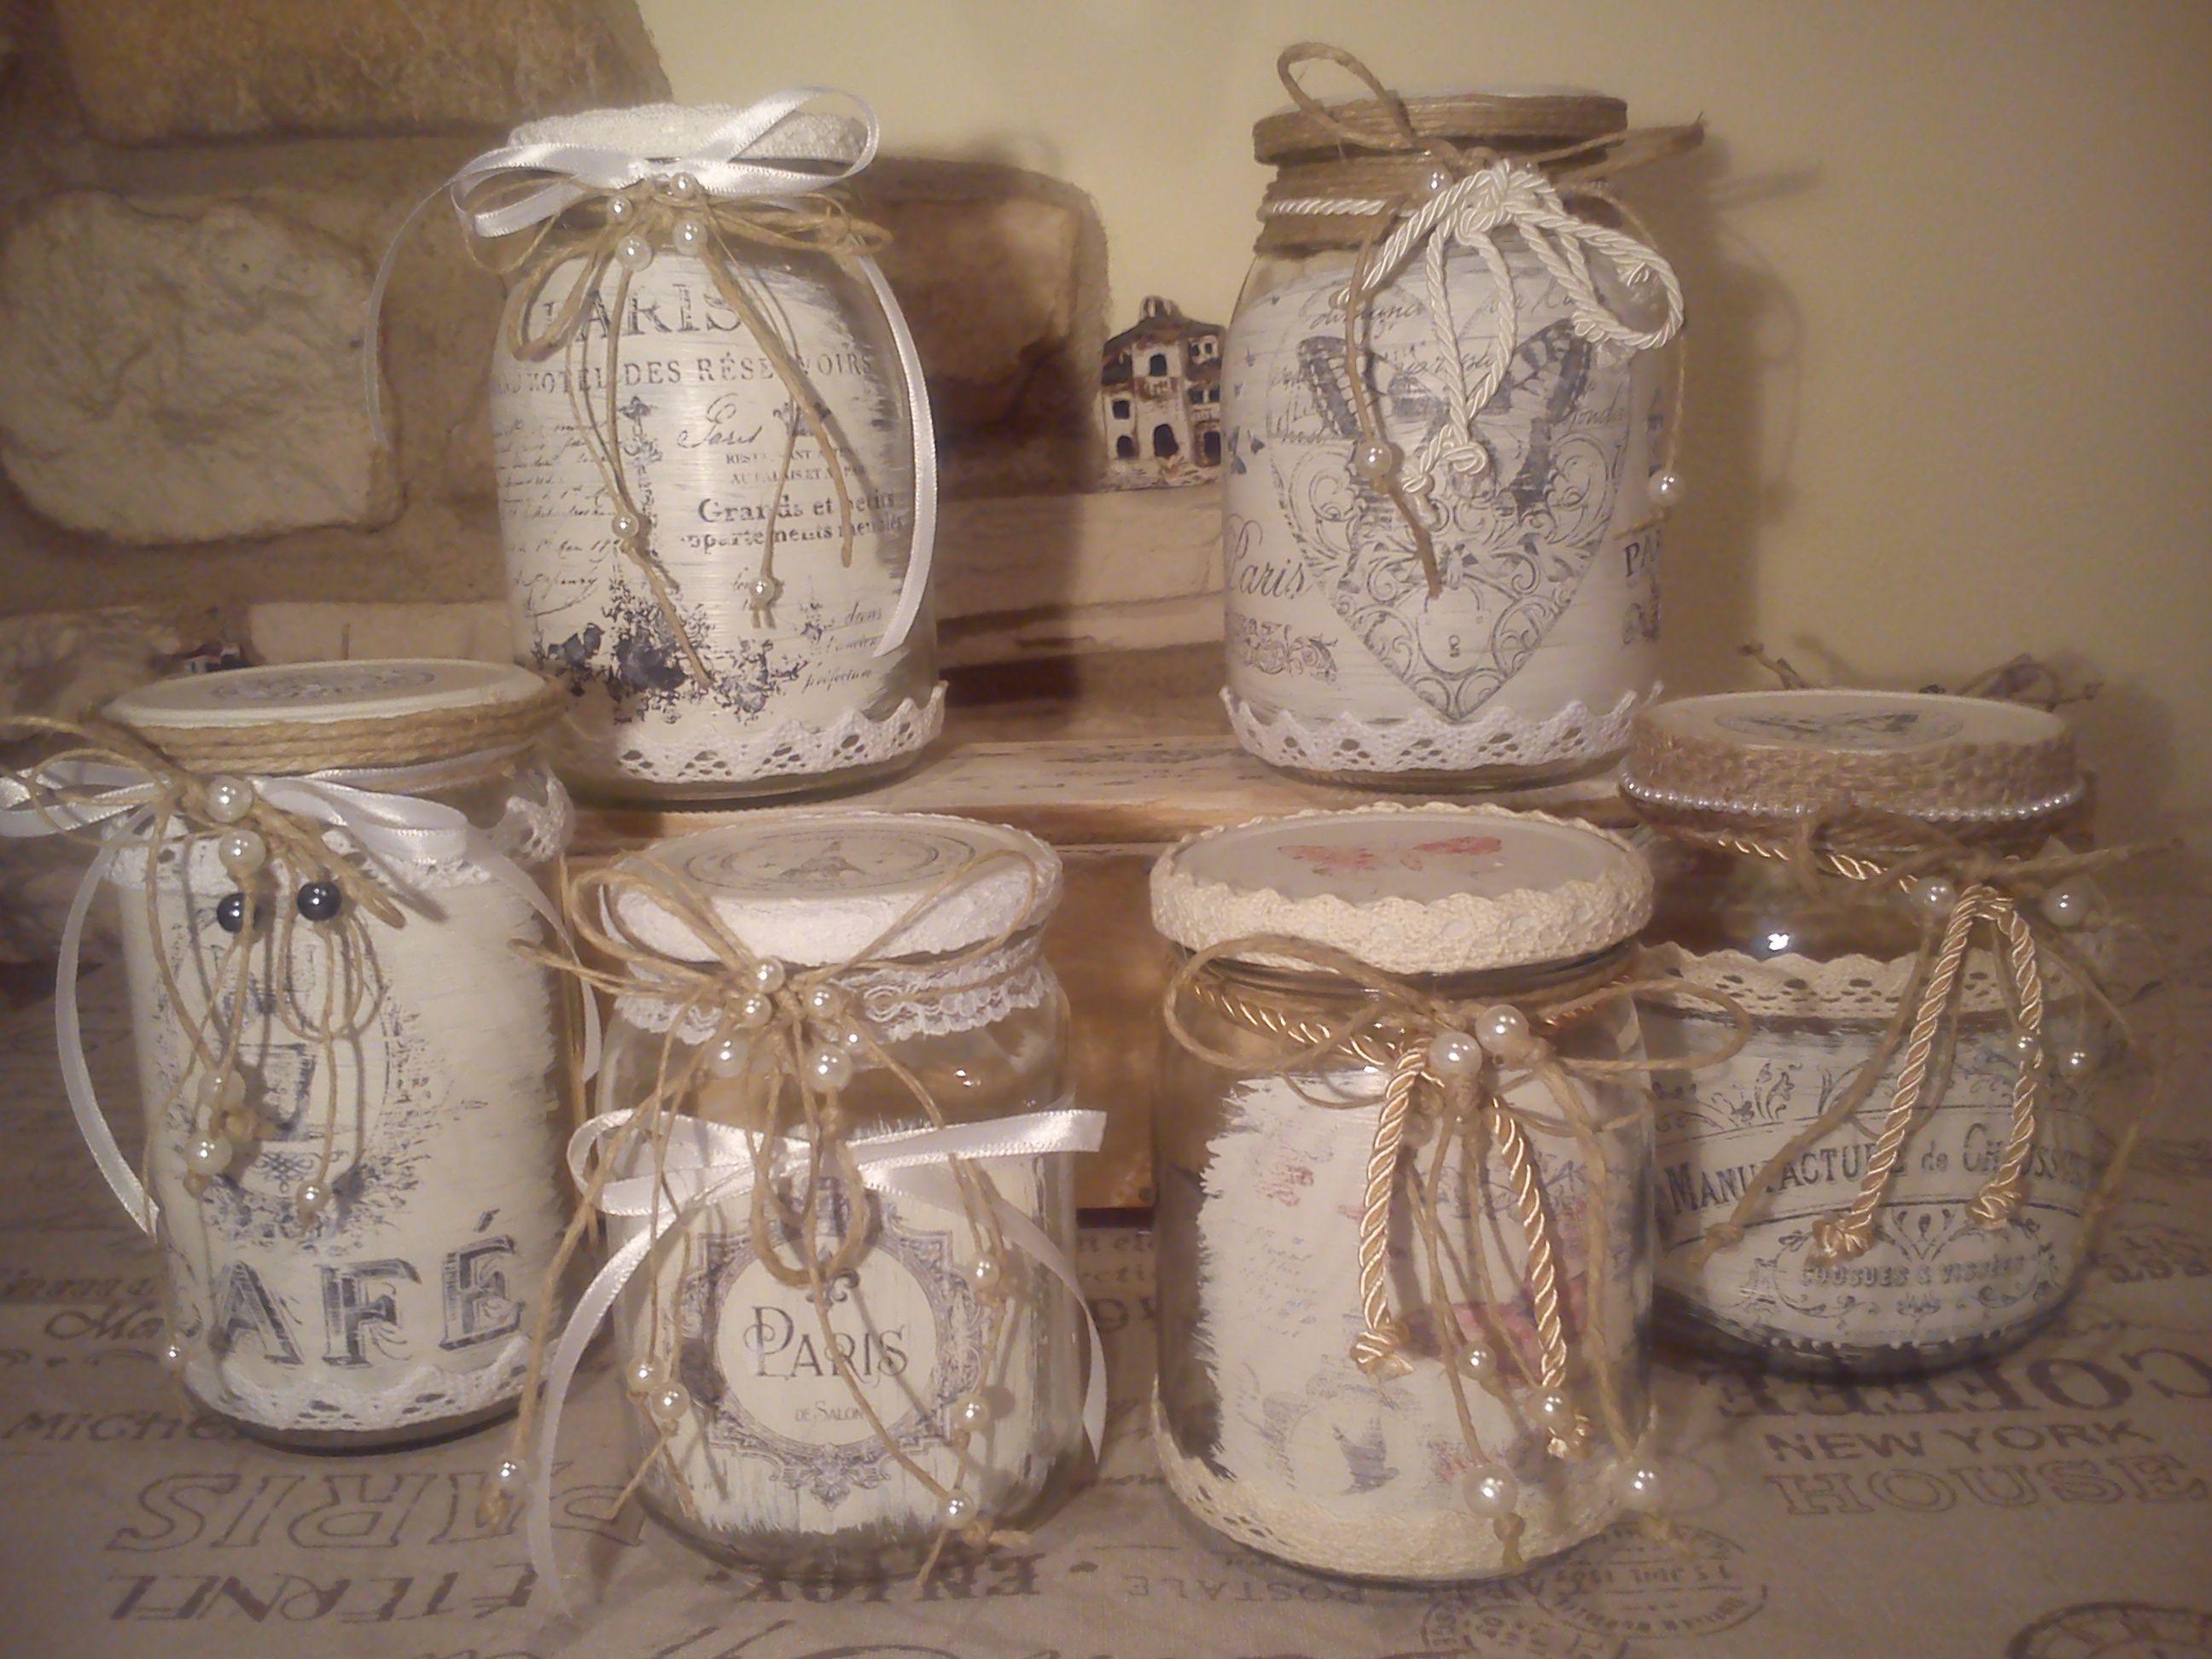 Riciclati vari vasetti di vetro e decorati in stile shabby